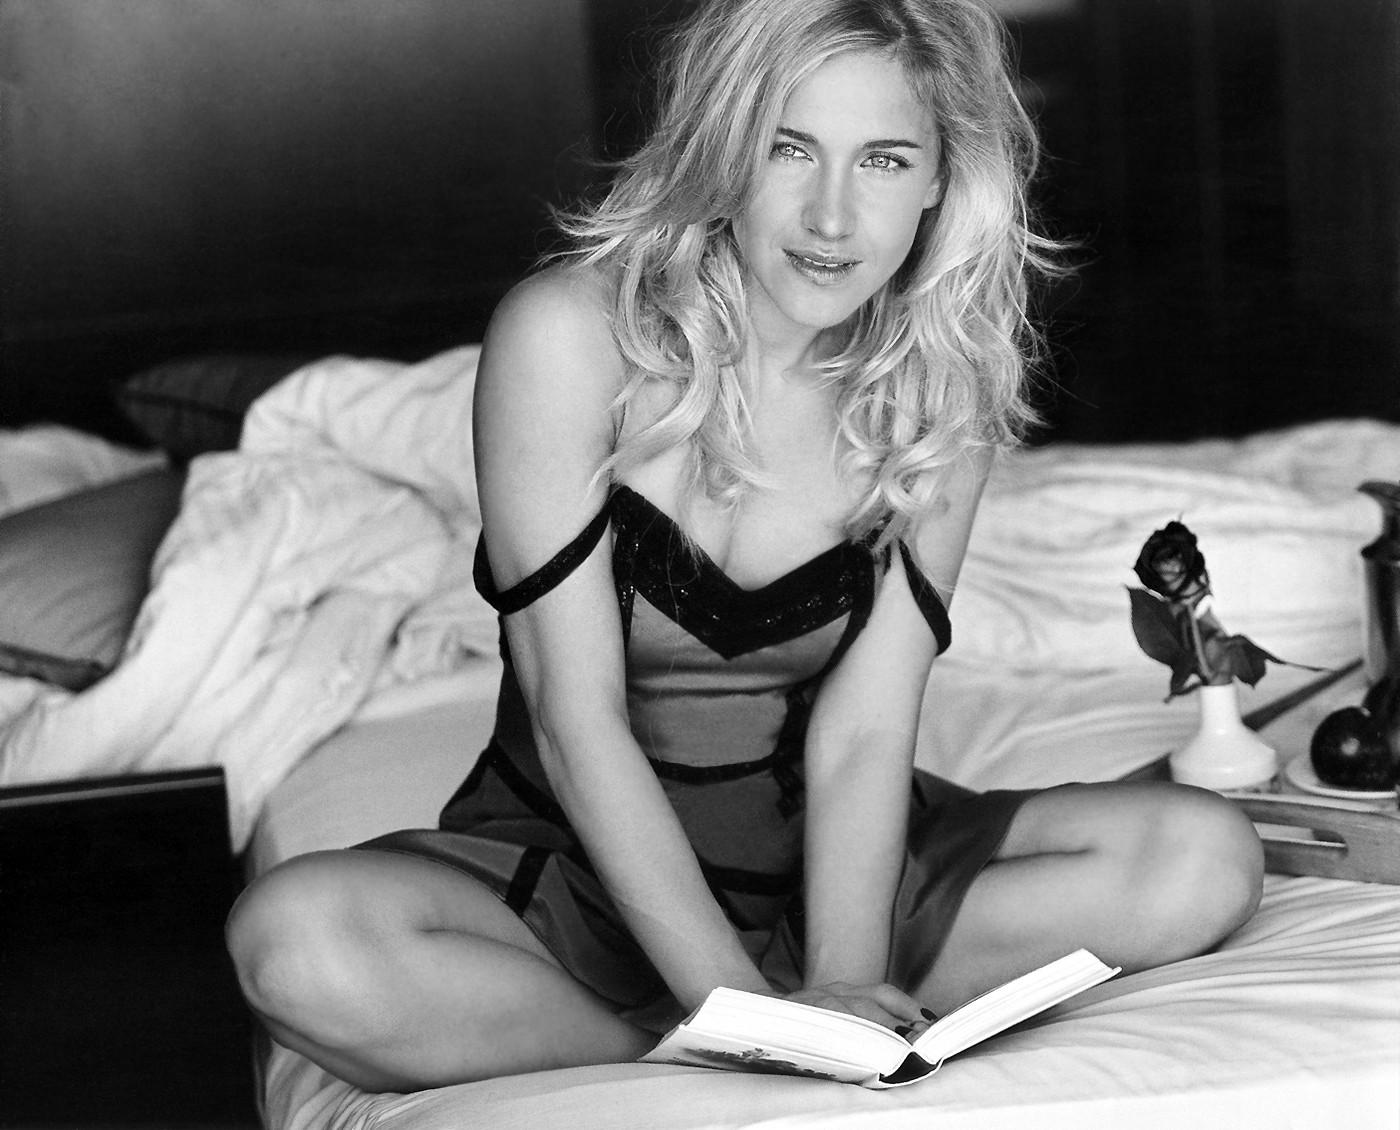 Images Julia Kovalchuk nude (32 foto and video), Tits, Paparazzi, Selfie, cameltoe 2018